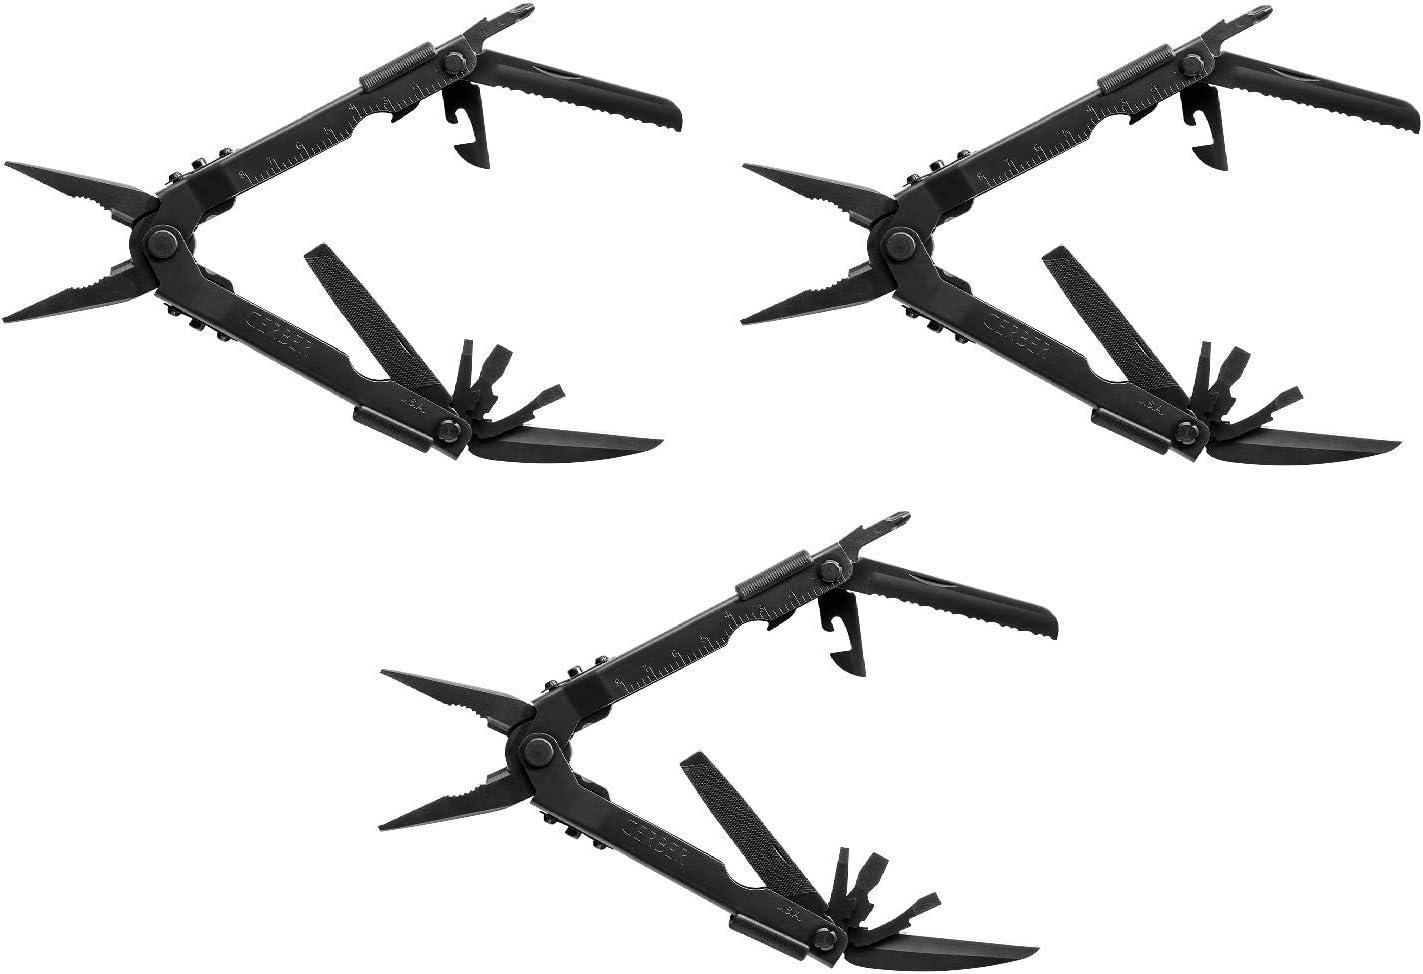 Gerber MP600 Multi-Plier 2021 Version Black 47550 Needle Nose